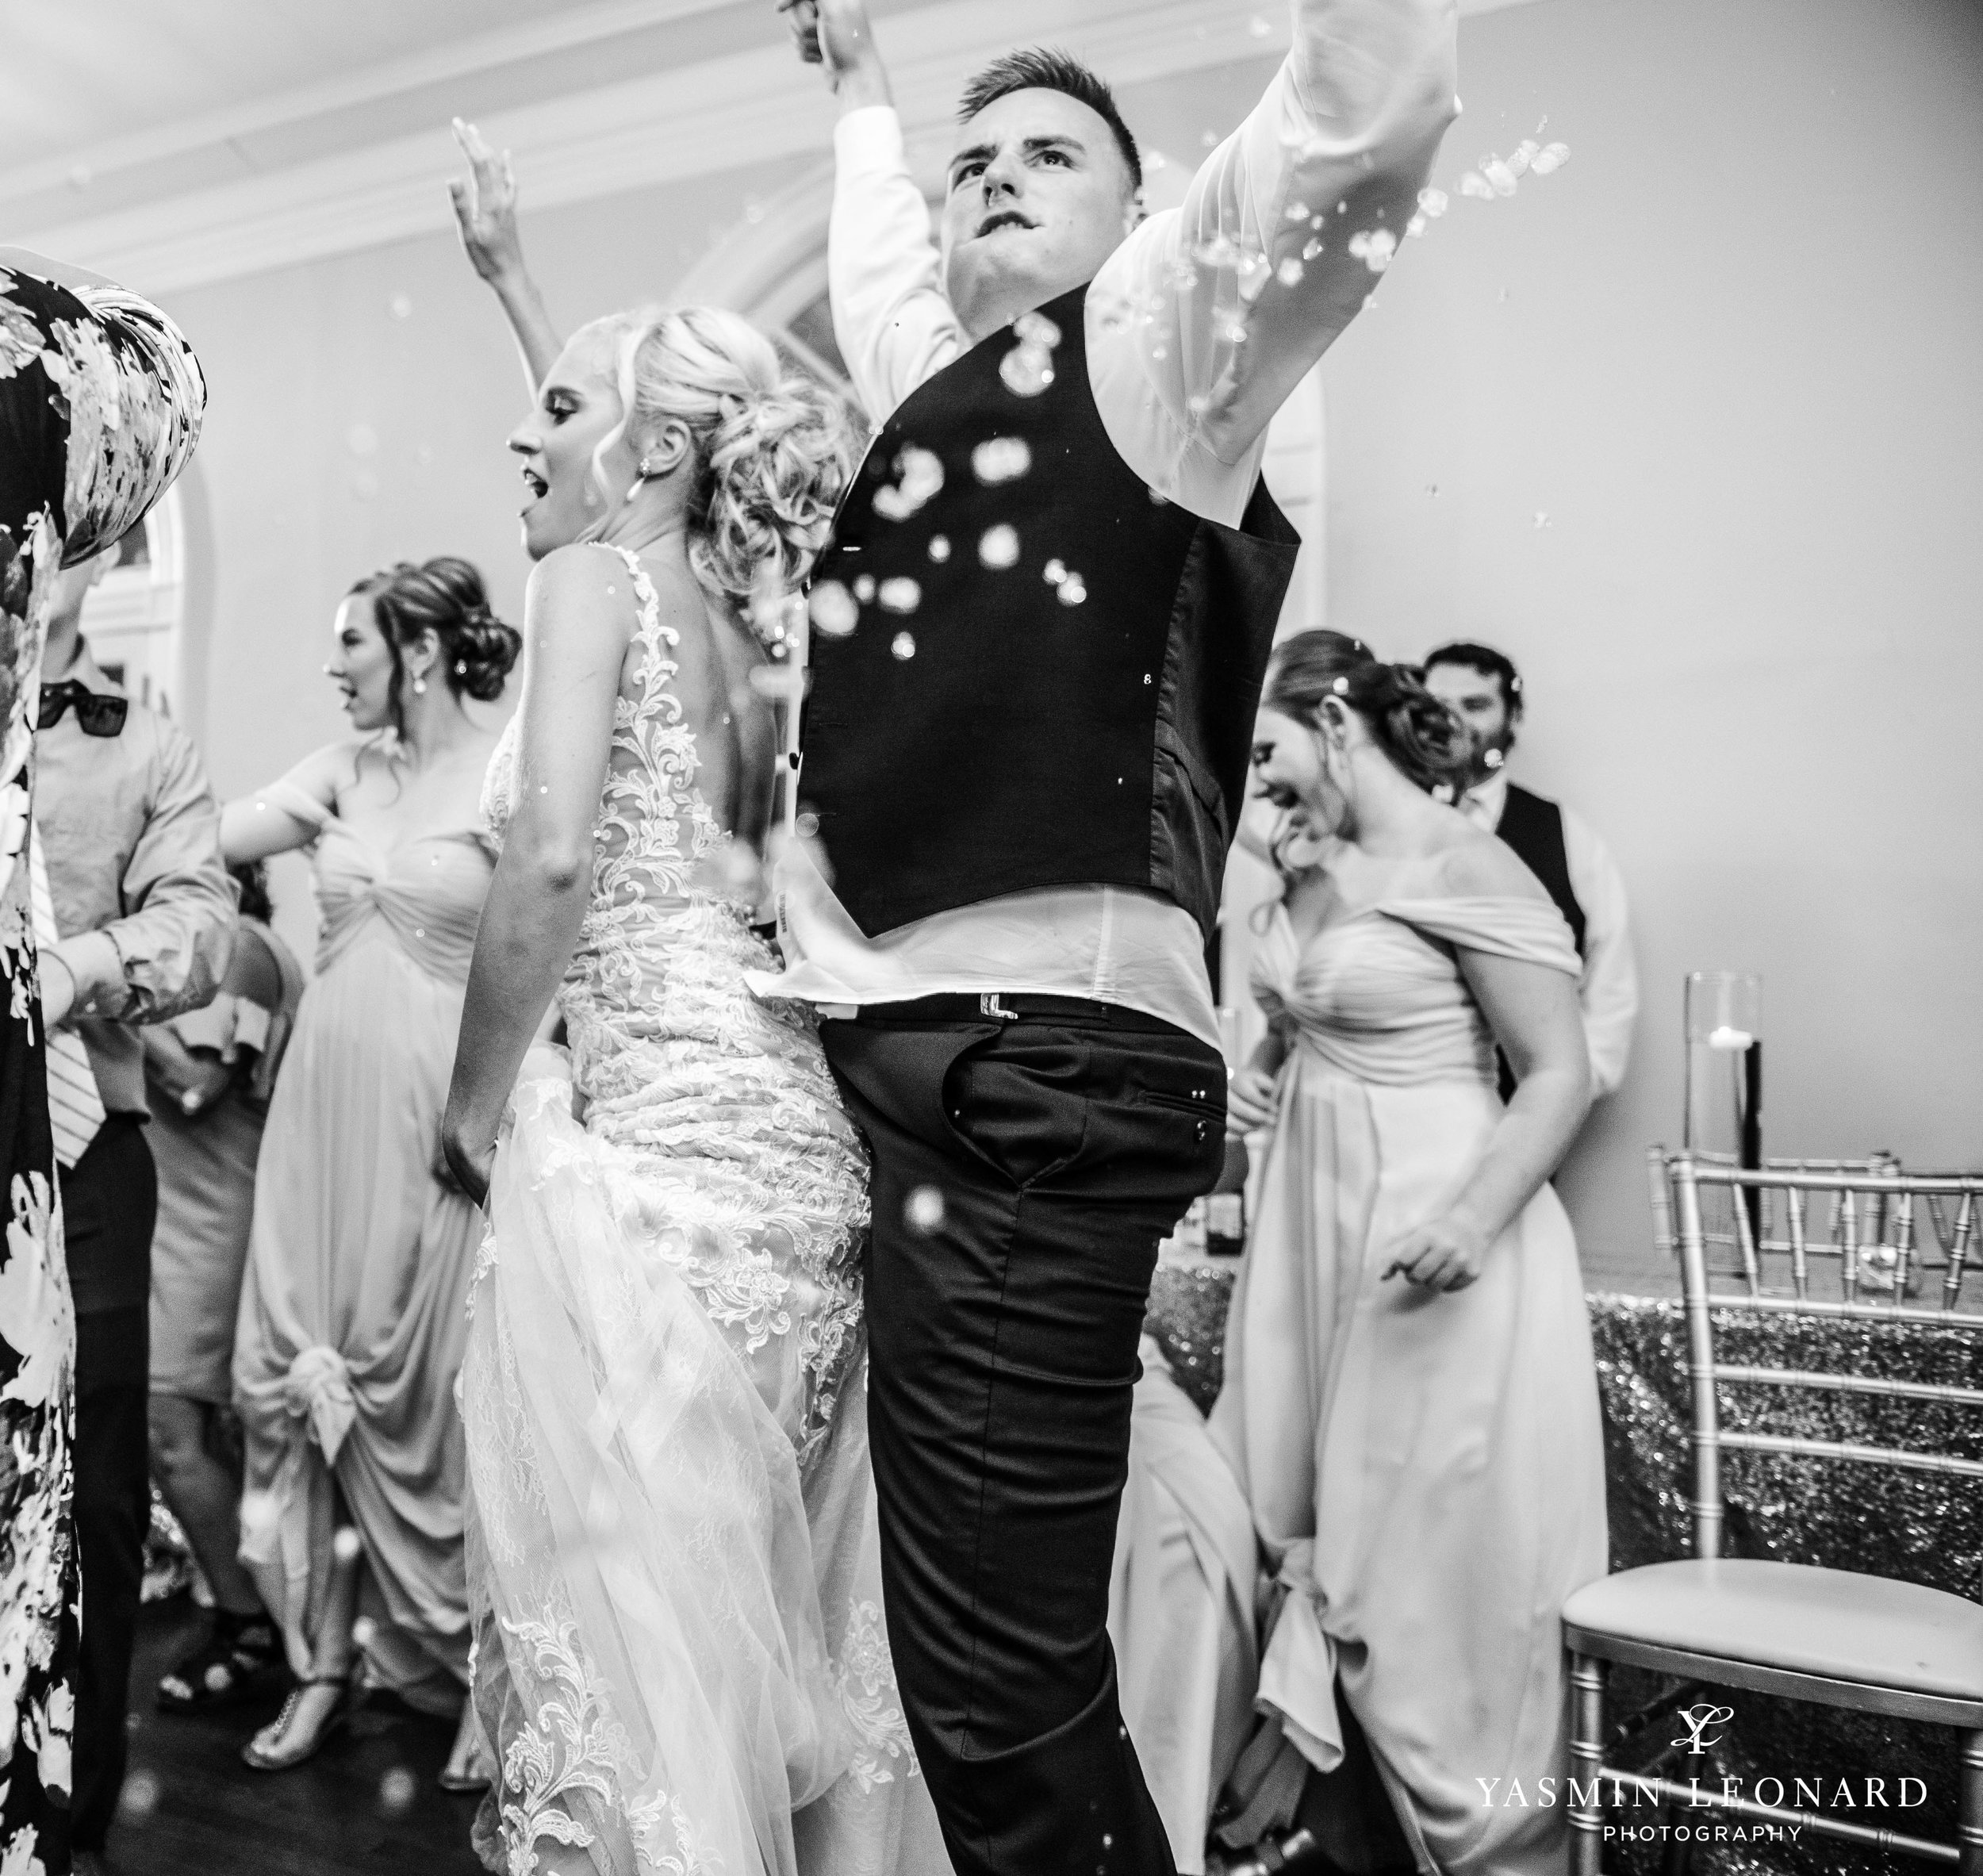 Separk Mansion - NC Weddings - Gastonia Wedding - NC Wedding Venues - Pink and Blue Wedding Ideas - Pink Bridesmaid Dresses - Yasmin Leonard Photography-69.jpg